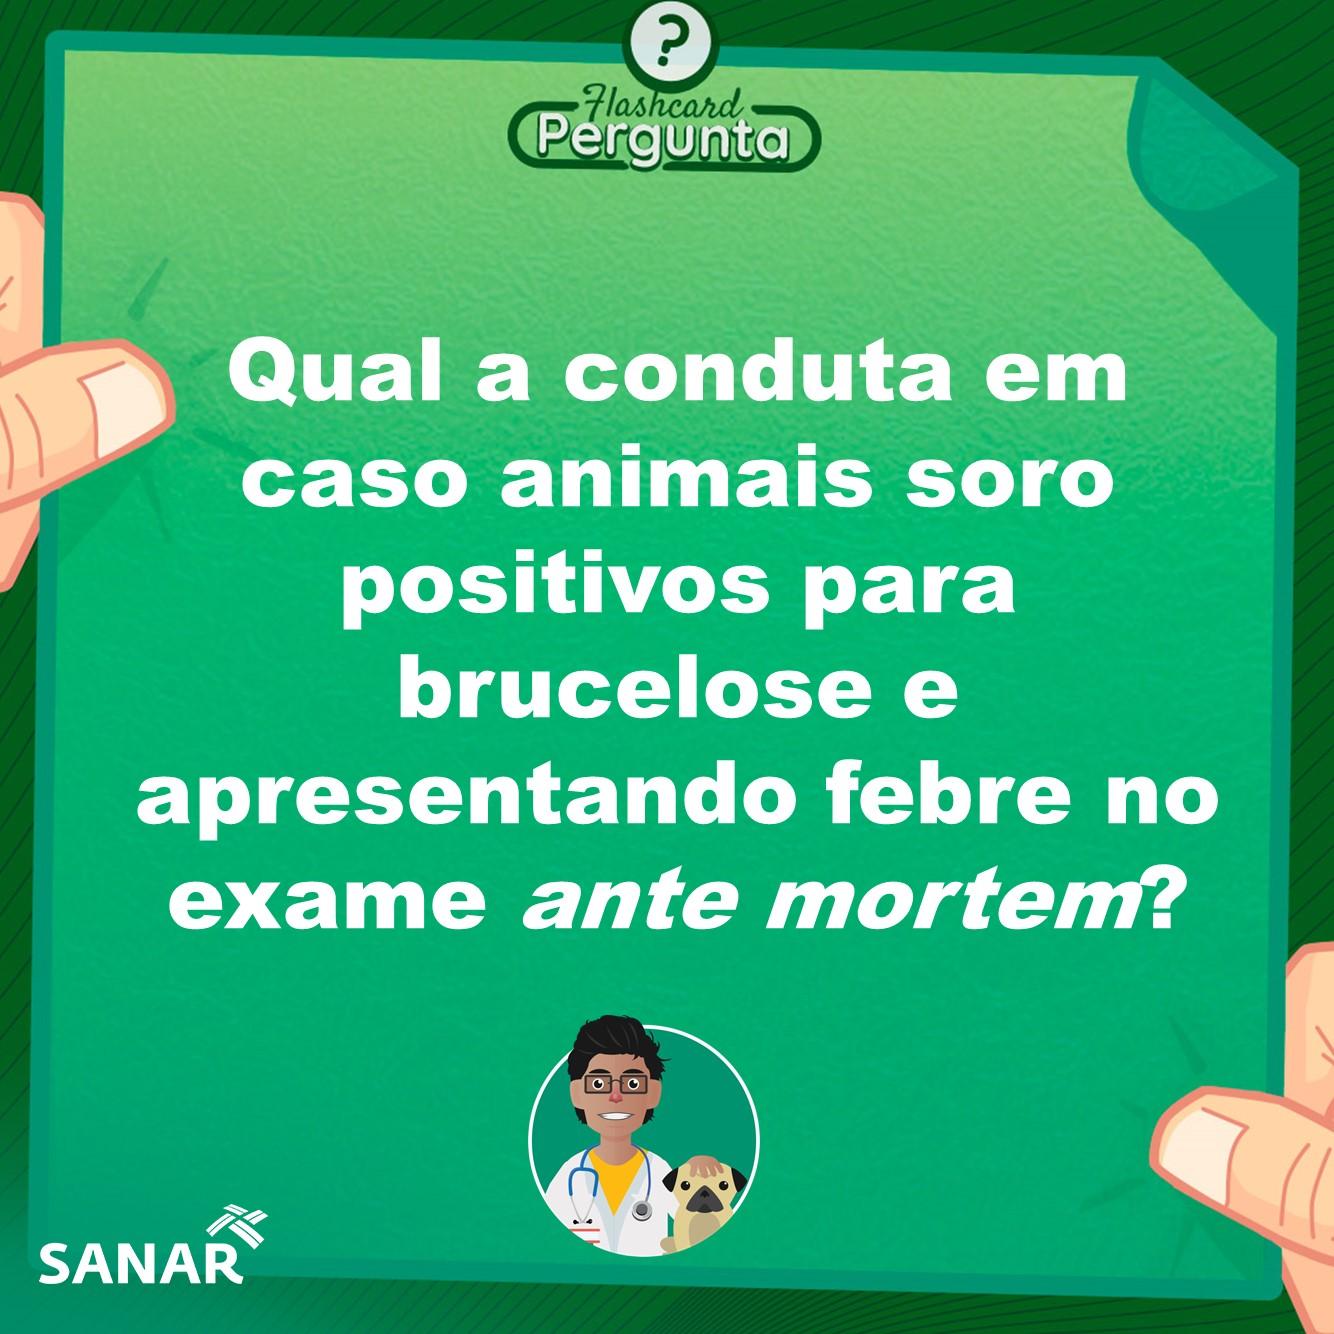 Flashcard sobre Brucelose Bovina| Medicina Veterinária